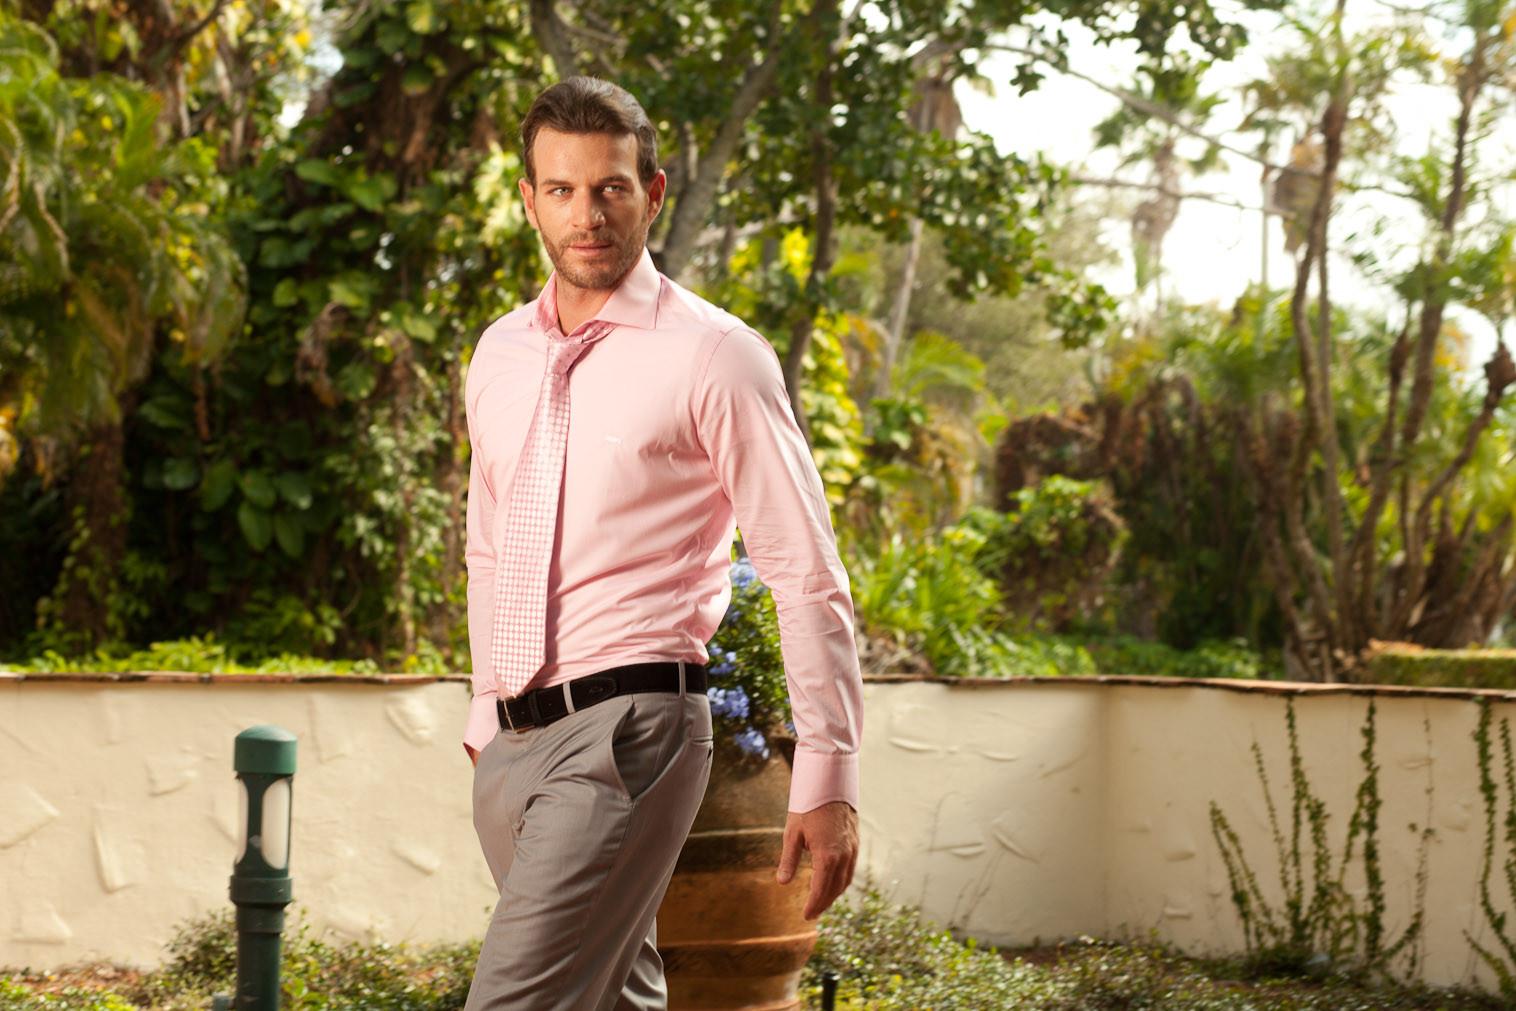 Men's Dress Shirts |  Light Pink Shirt with Pink Stripe | Miltiadis XIII 03